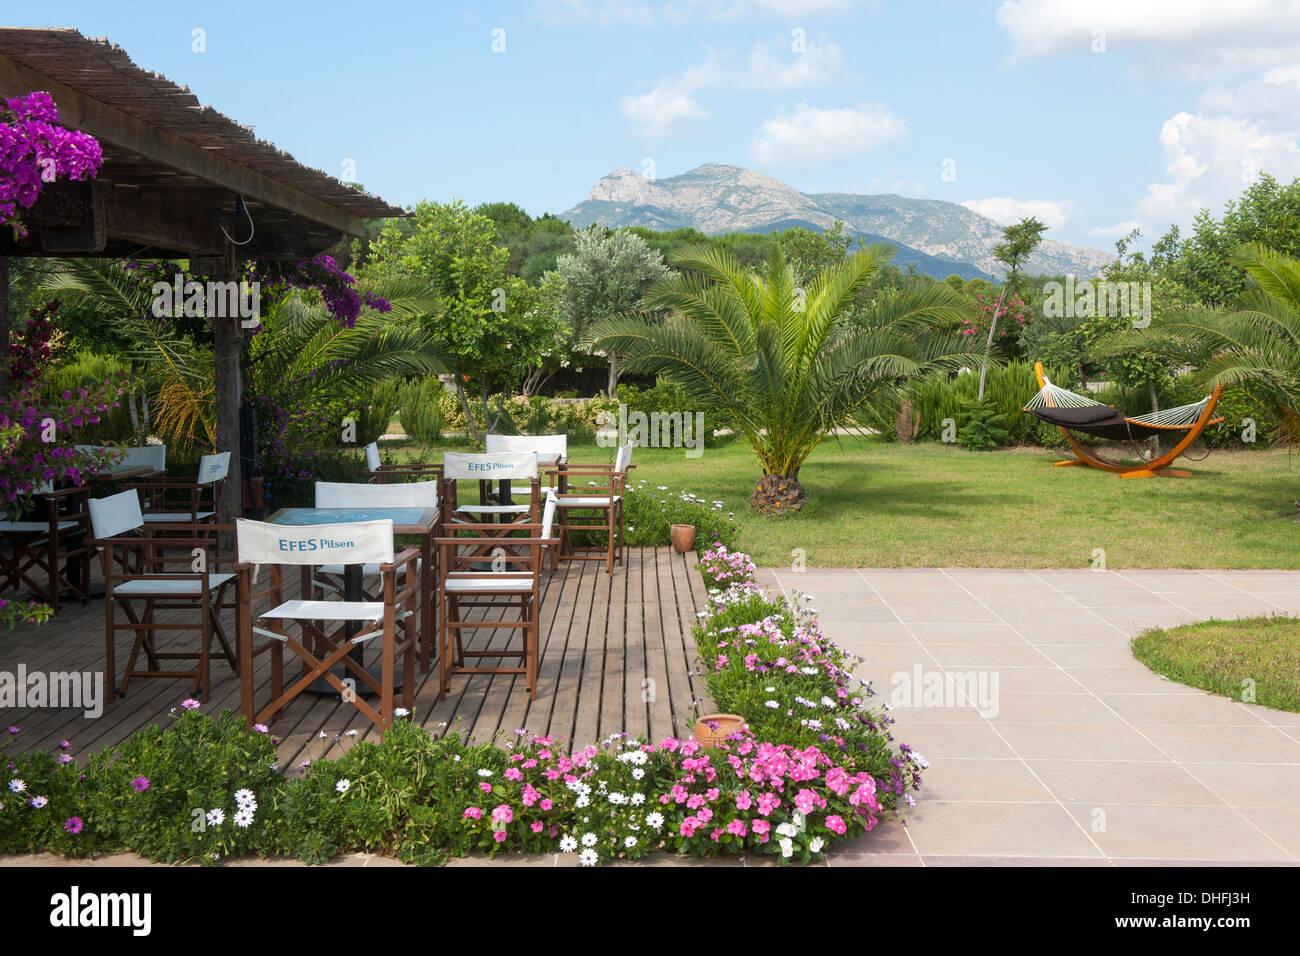 Asien, Türkei, Provinz Mugla, Datca-Halbinsel, Flow Datca Surf & Beach Club Hotel bei Datca - Stock Image